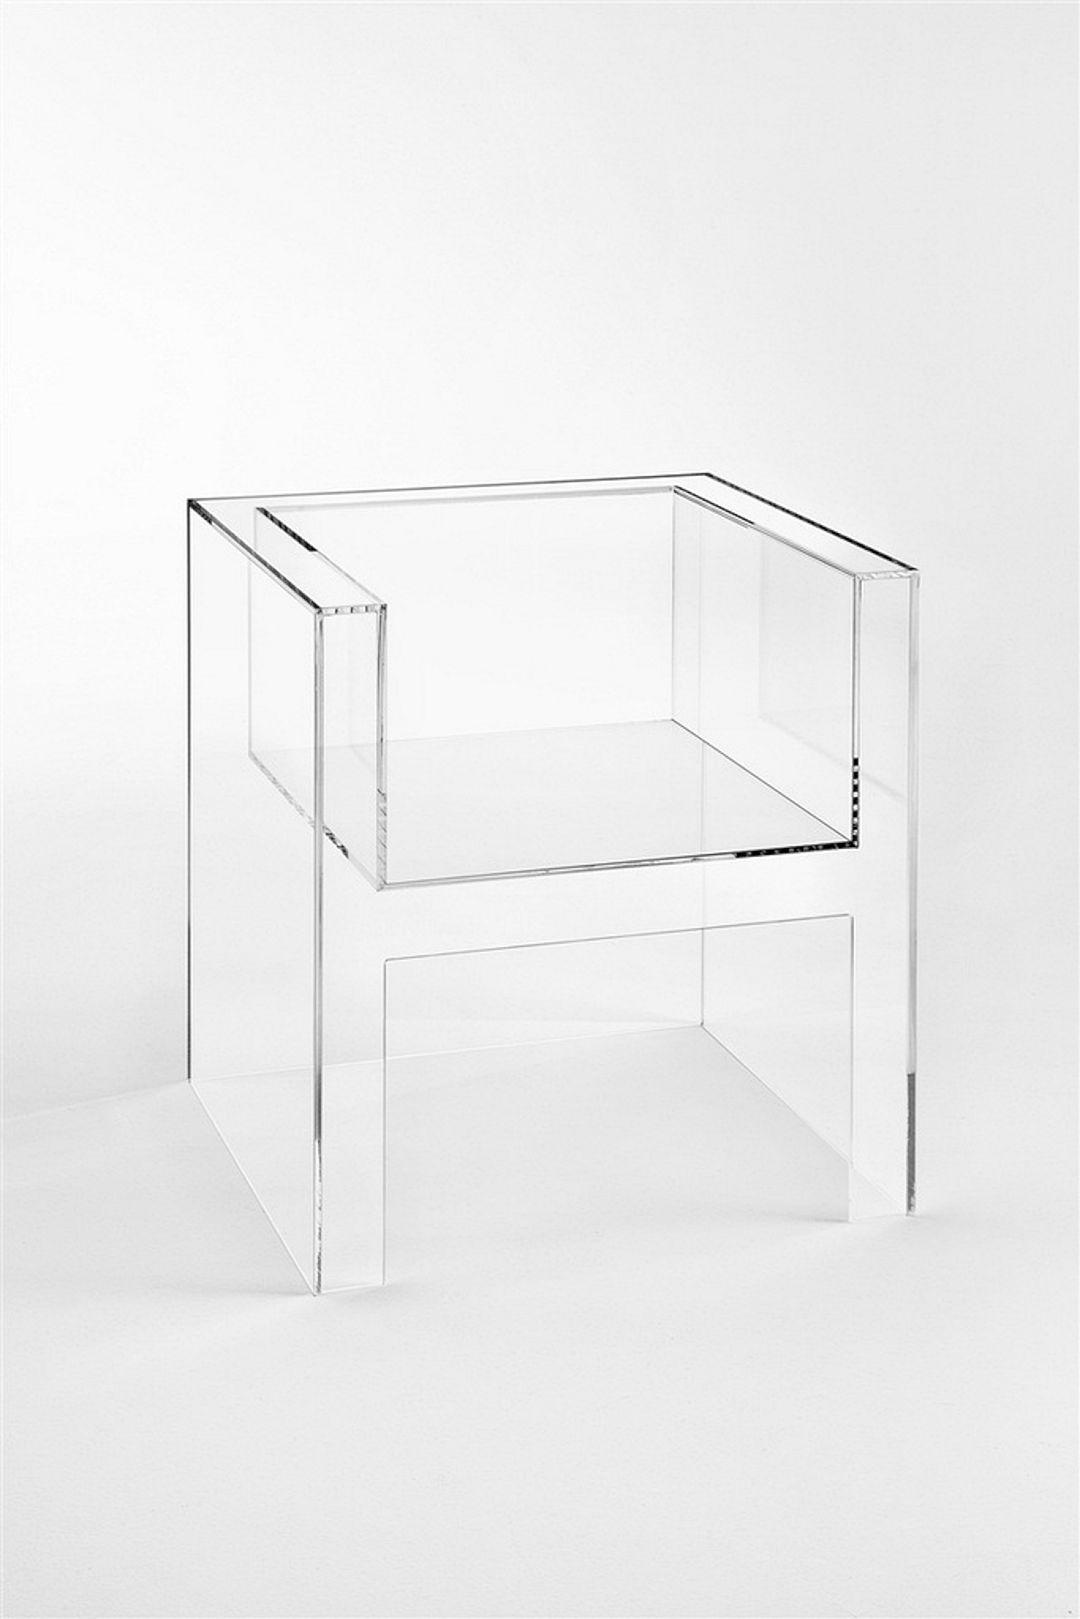 35 Stunning Contemporary Living Room Design Ideas: 35 Stunning Minimalist Furniture Design Ideas For Your